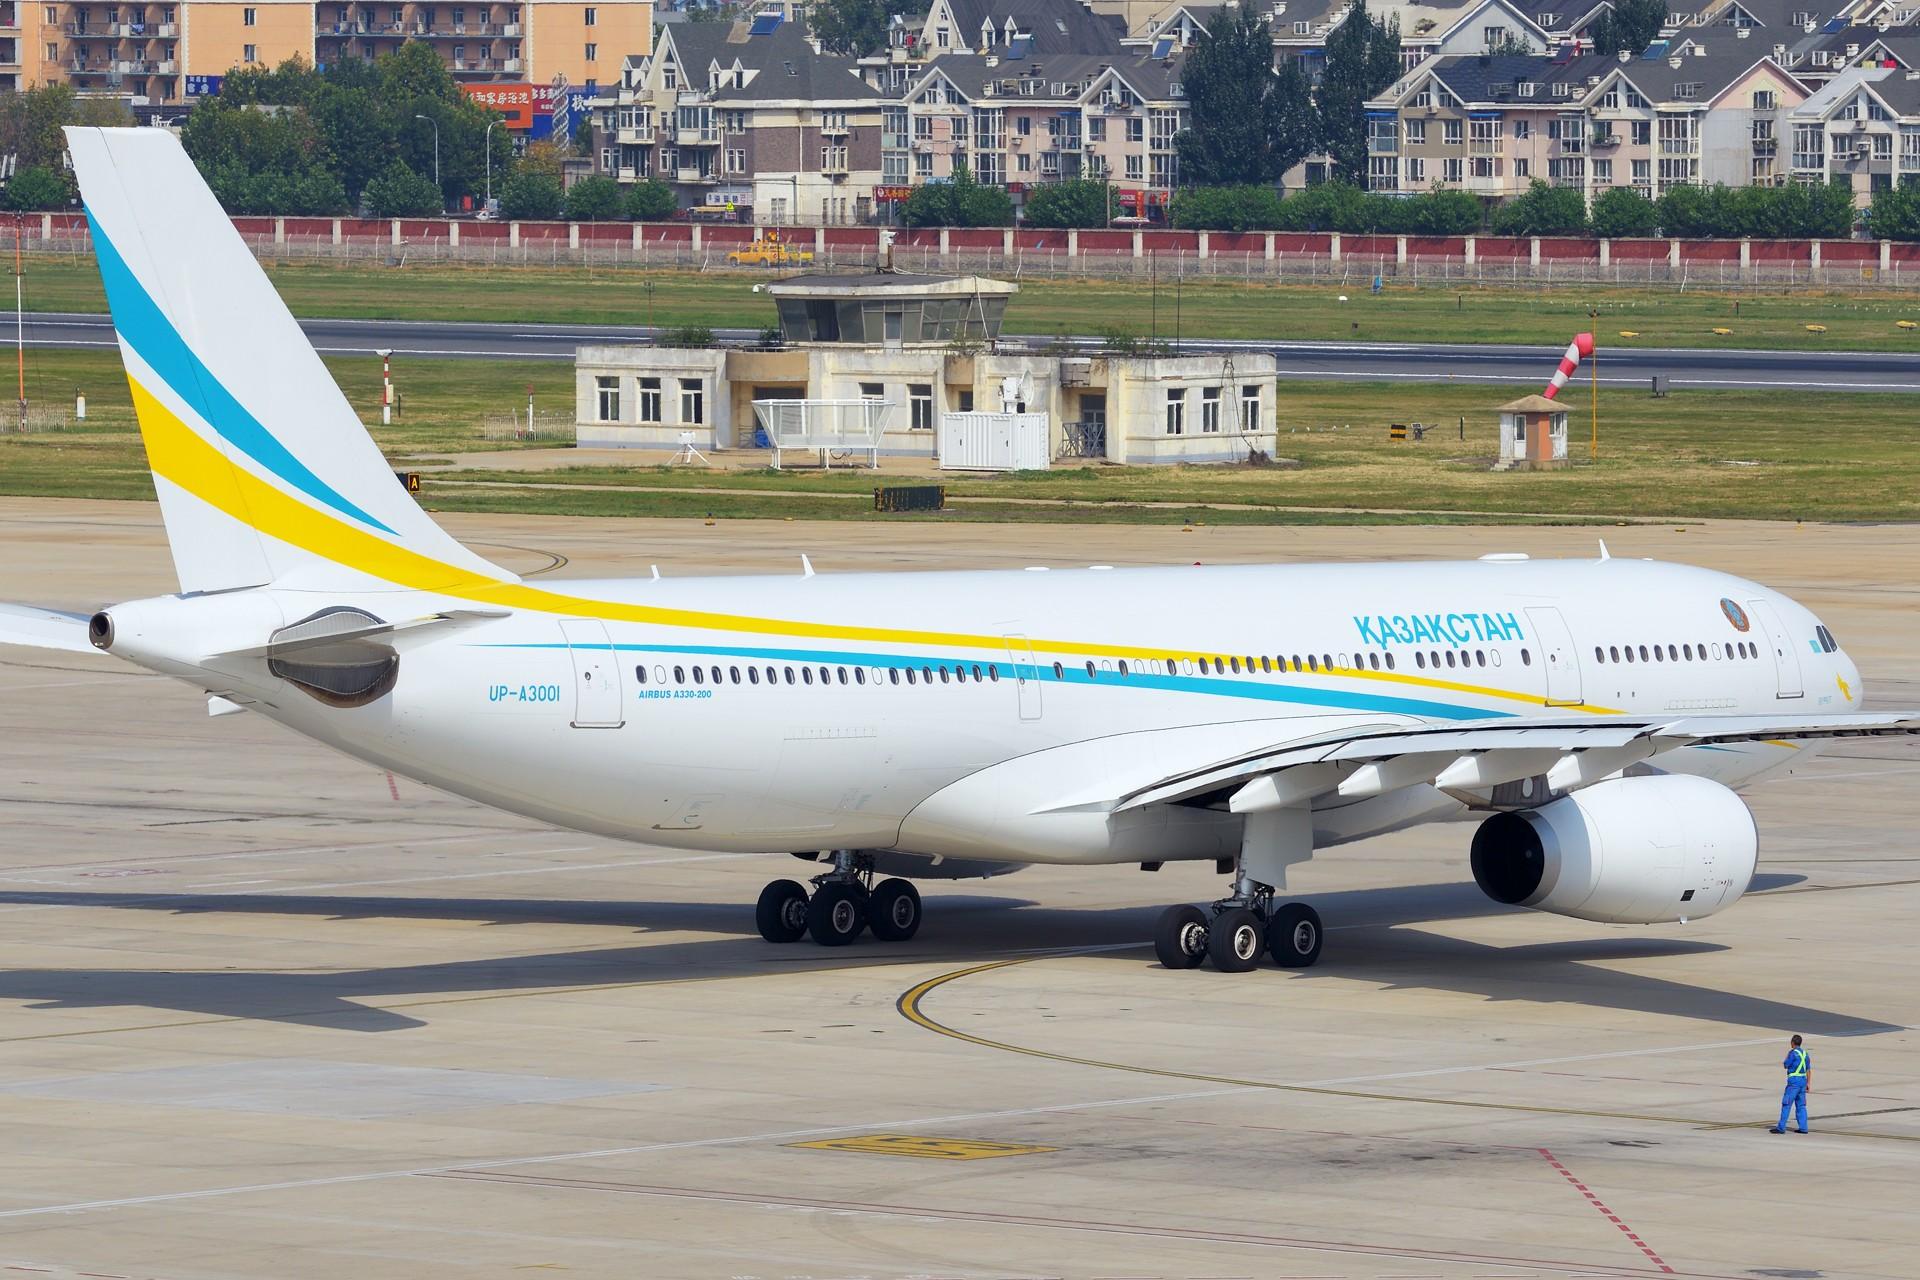 Re:[原创]★[DLC]一点有趣的事情(国庆加点儿料)★ AIRBUS A330-200 UP-A3001 中国大连国际机场